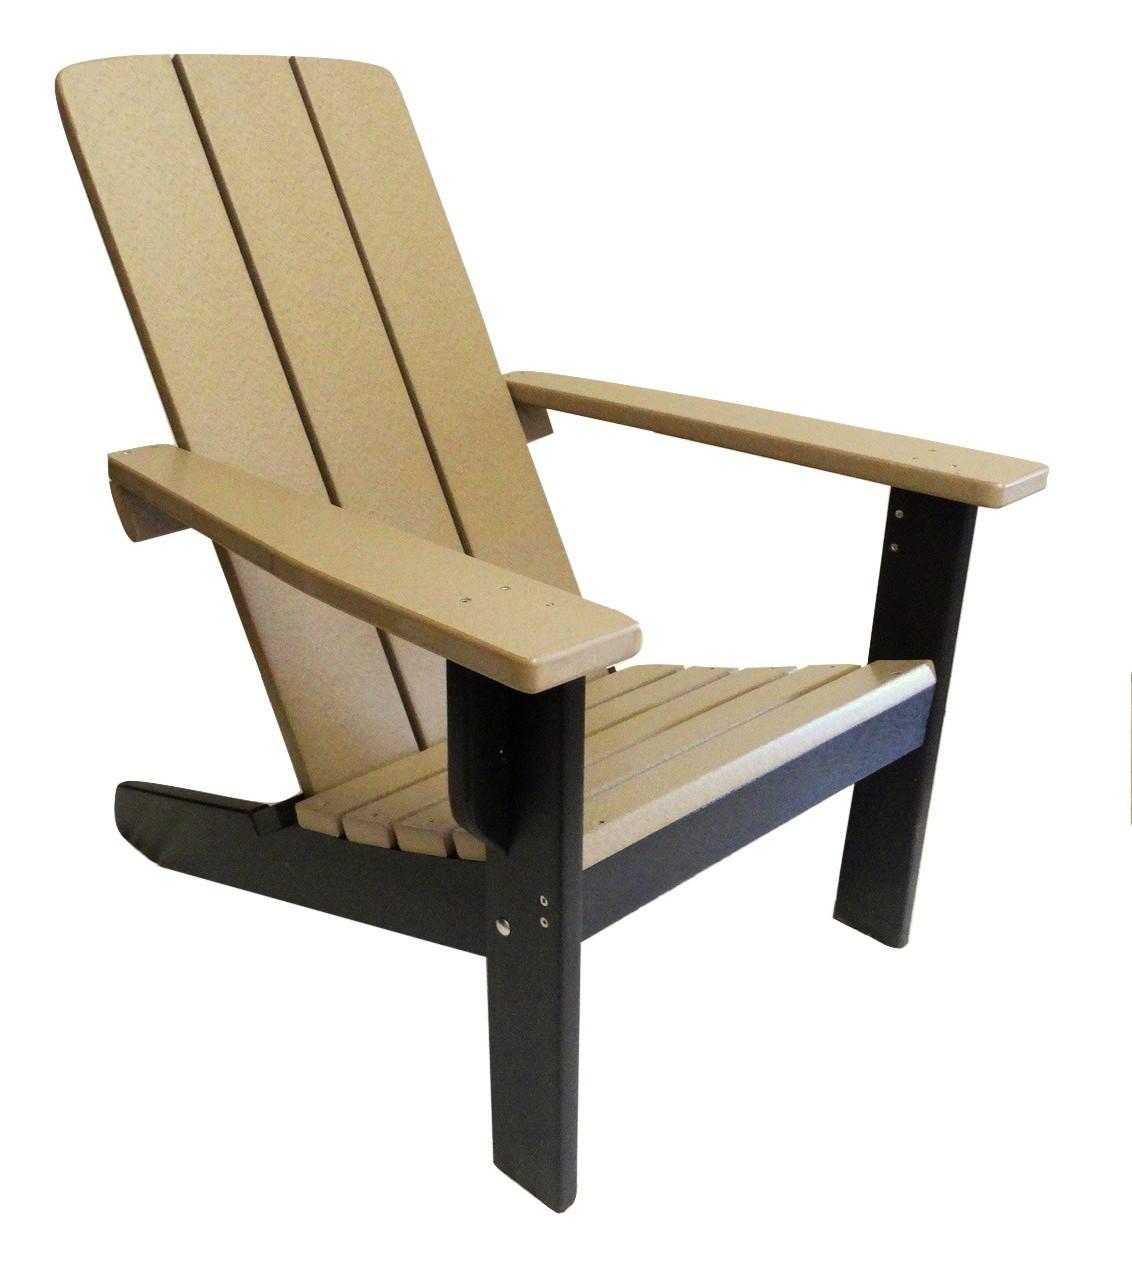 Two Tone Modern Adirondack Chairs